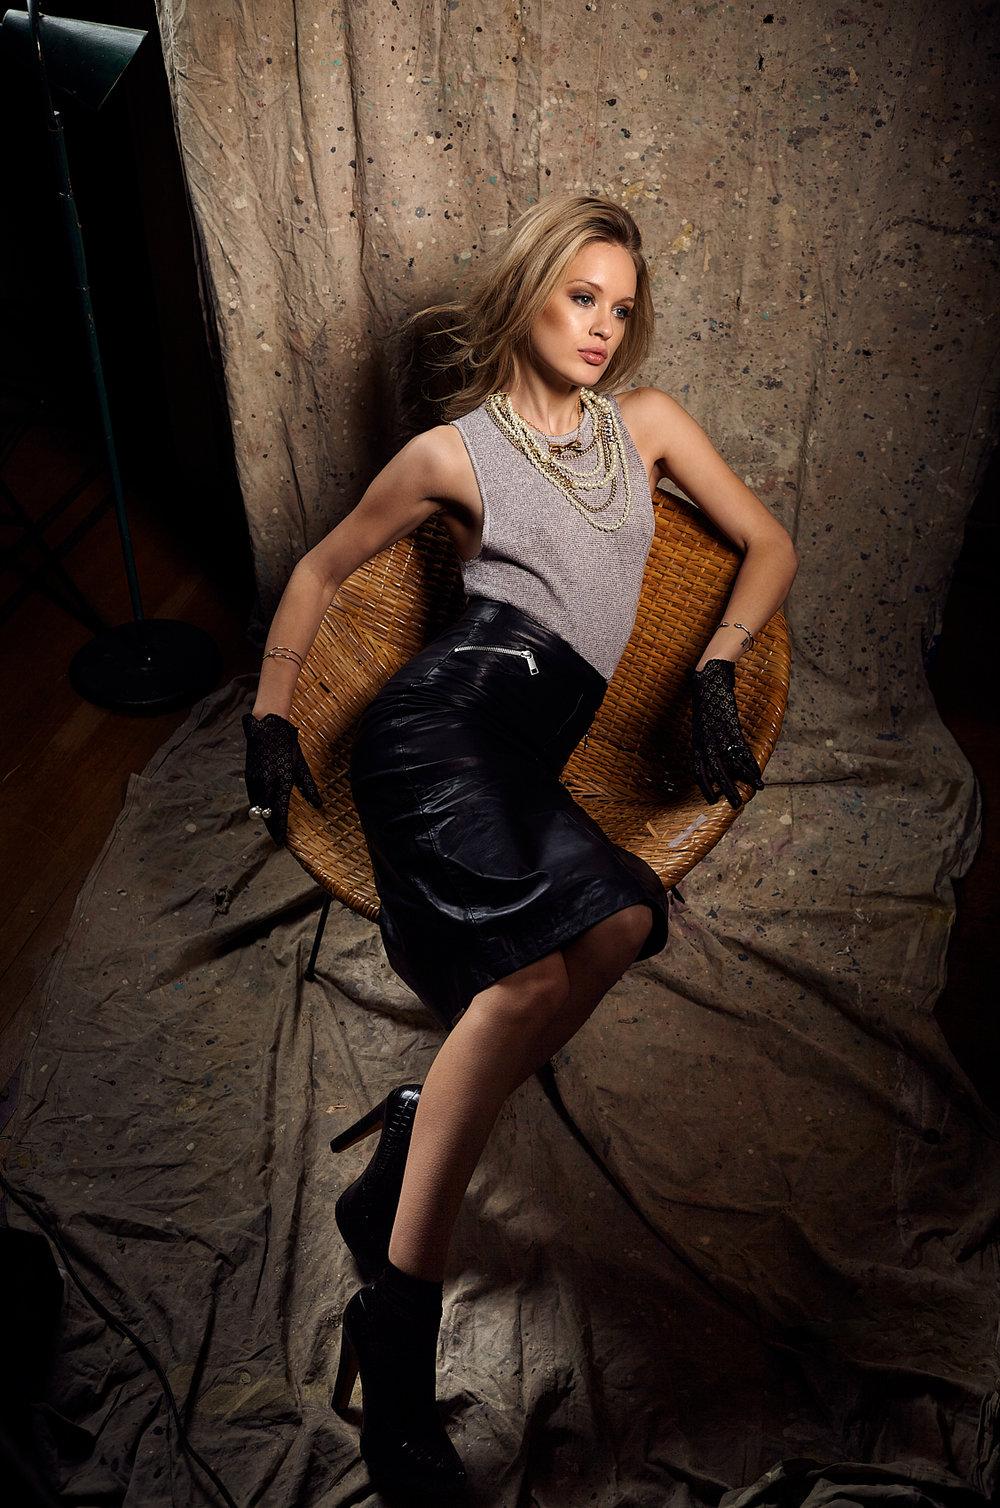 Fashion model photoshoot Vancouver Photographer 13.jpg